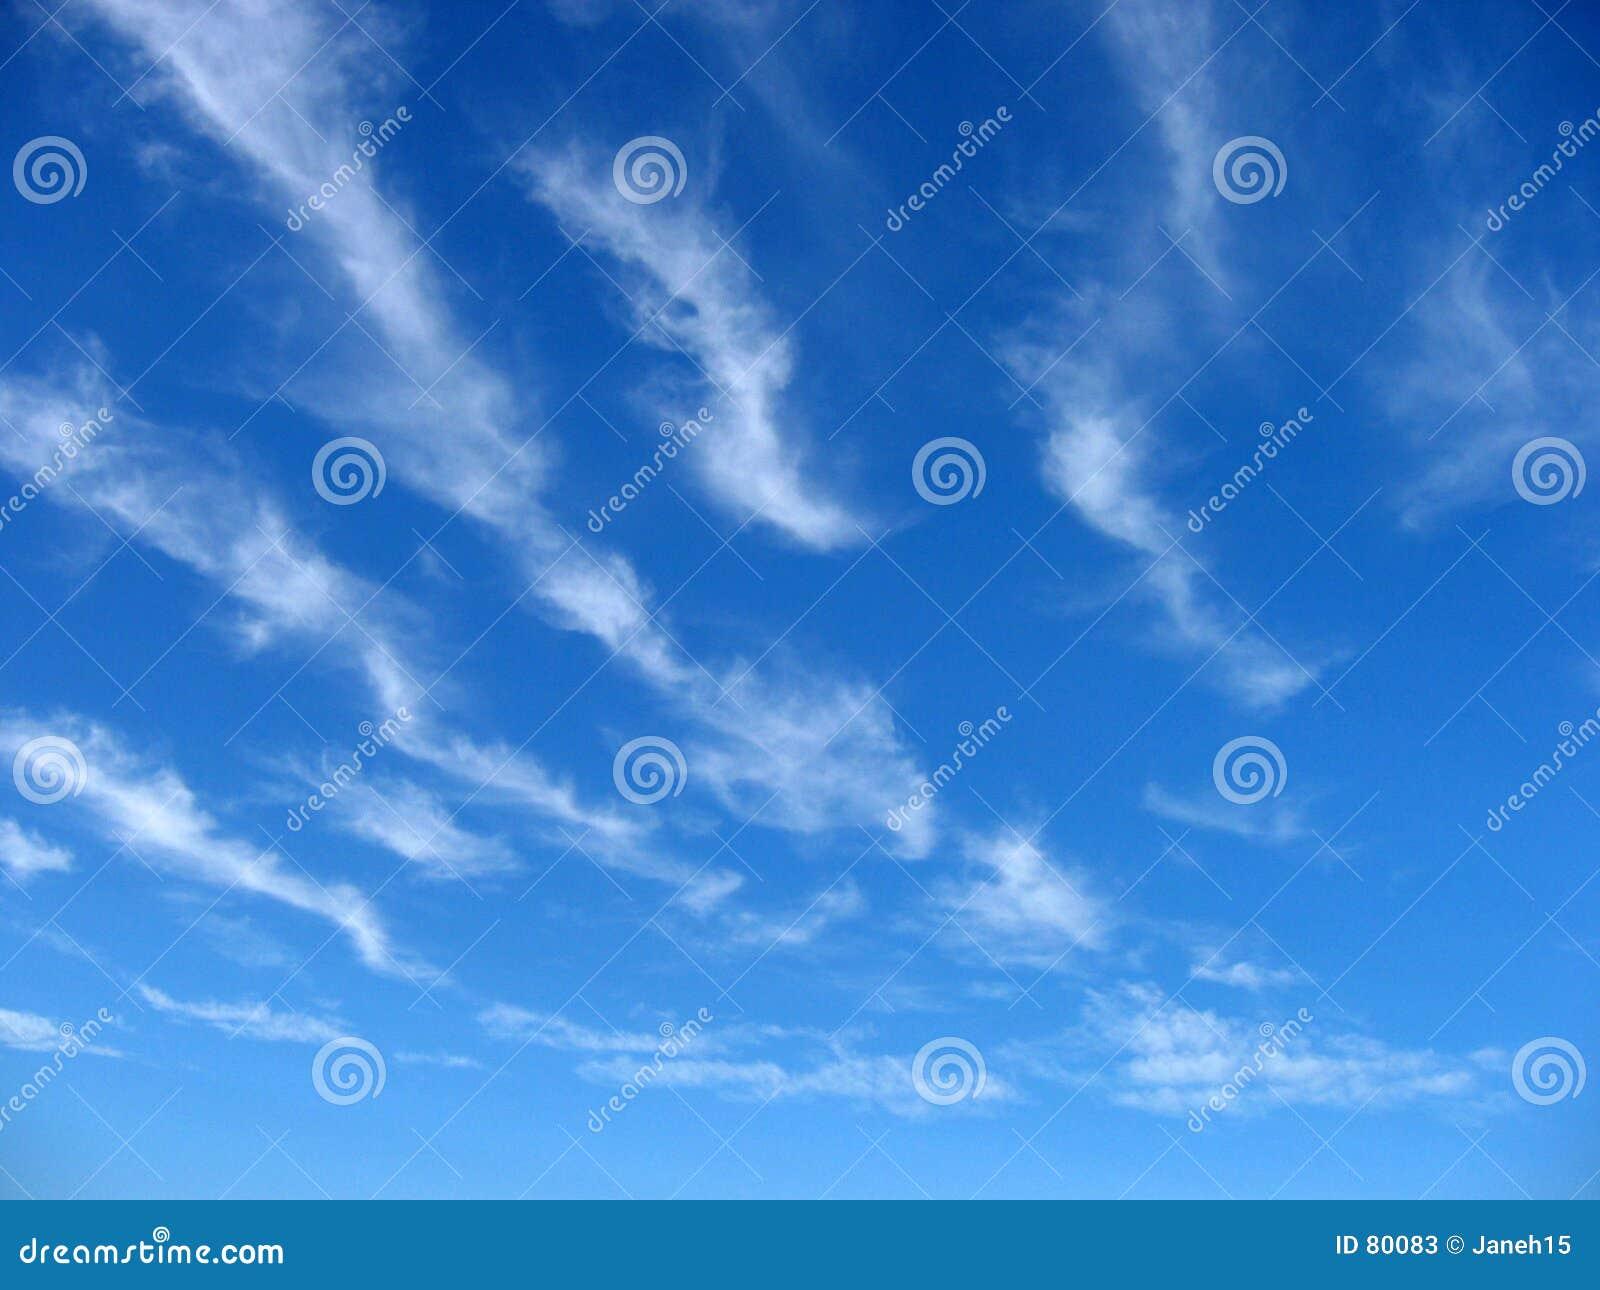 Wispy Clouds Stock Photos - Image: 80083